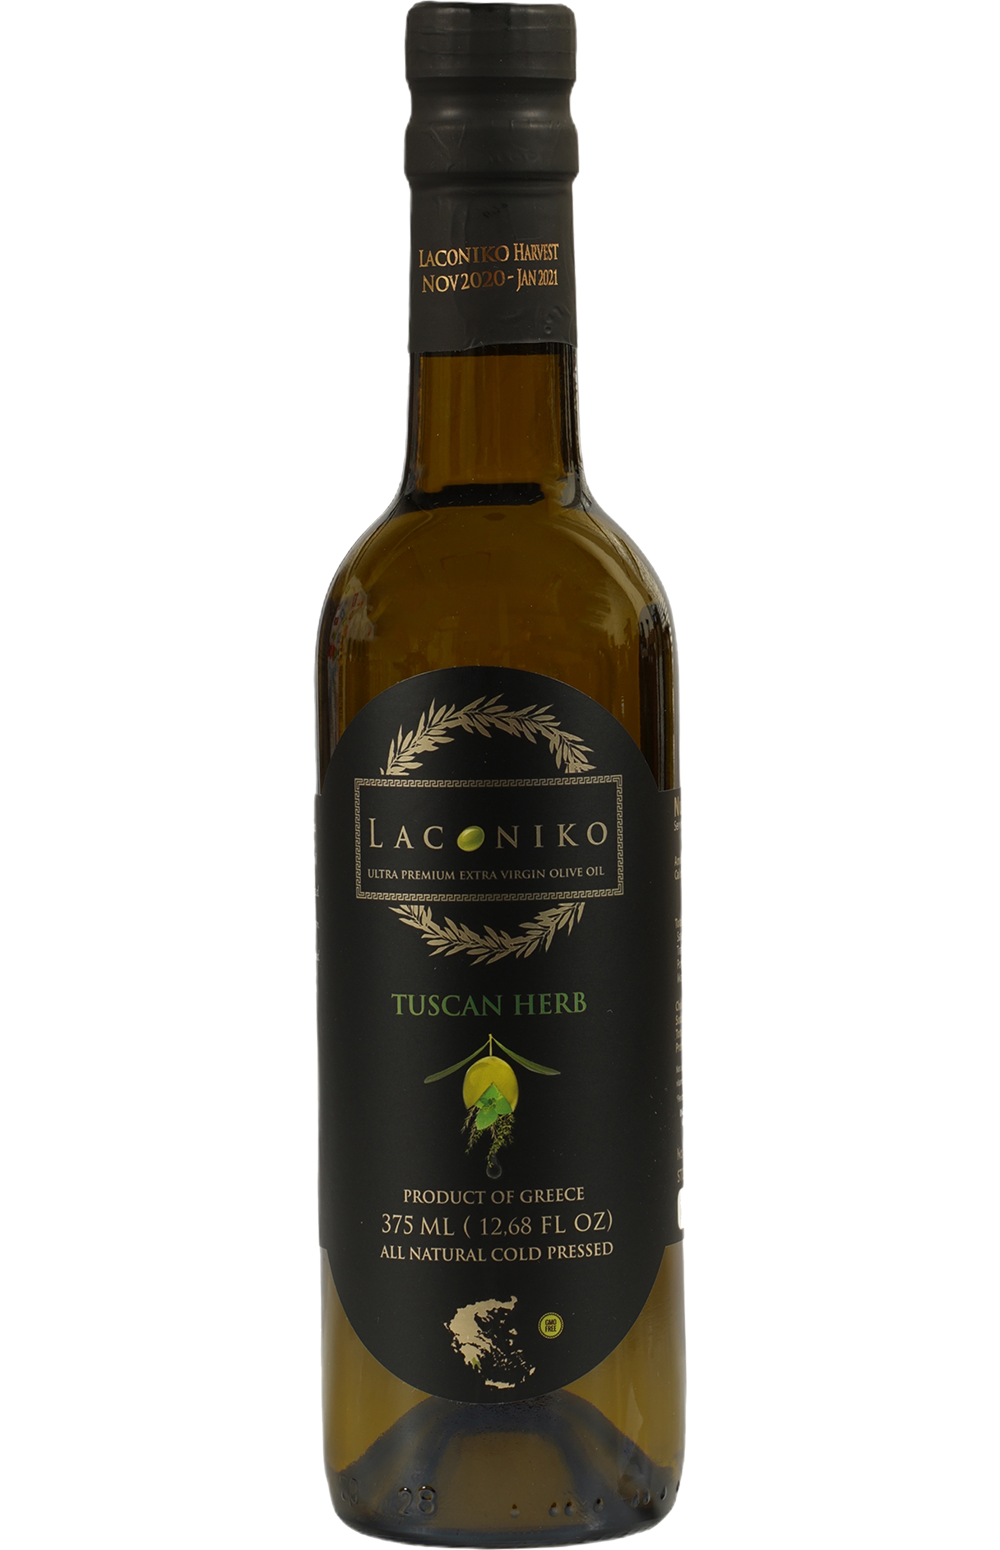 Laconico Tuscan Herb